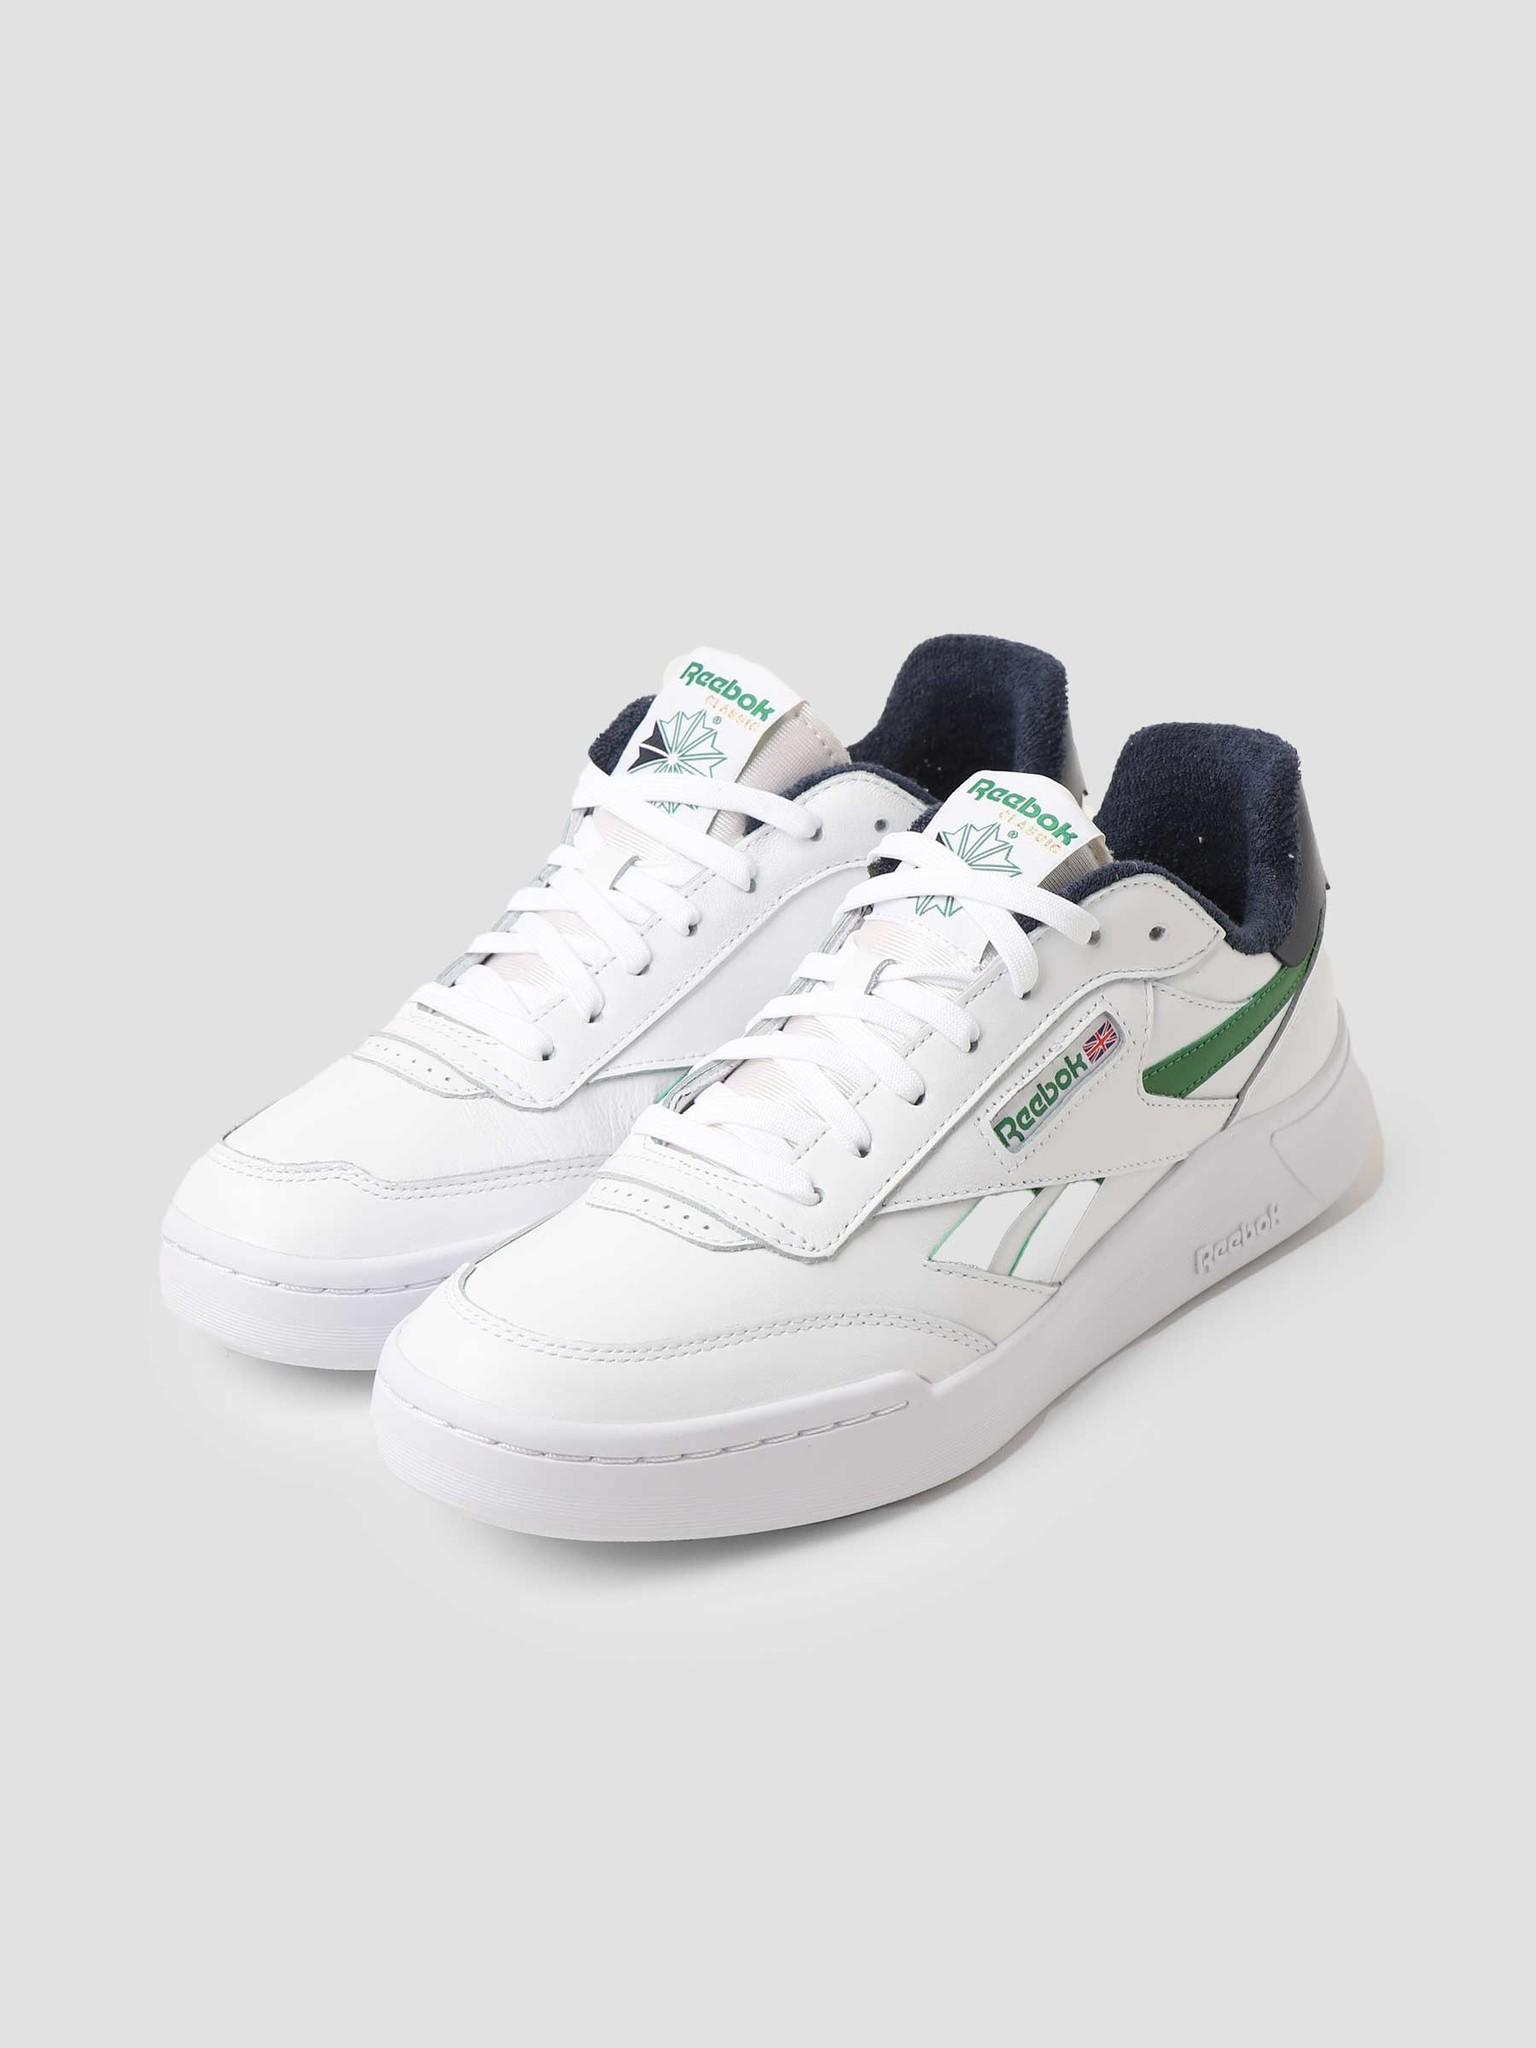 Reebok Reebok Club C Legacy Revenge Footwear White Green Navy GX7888